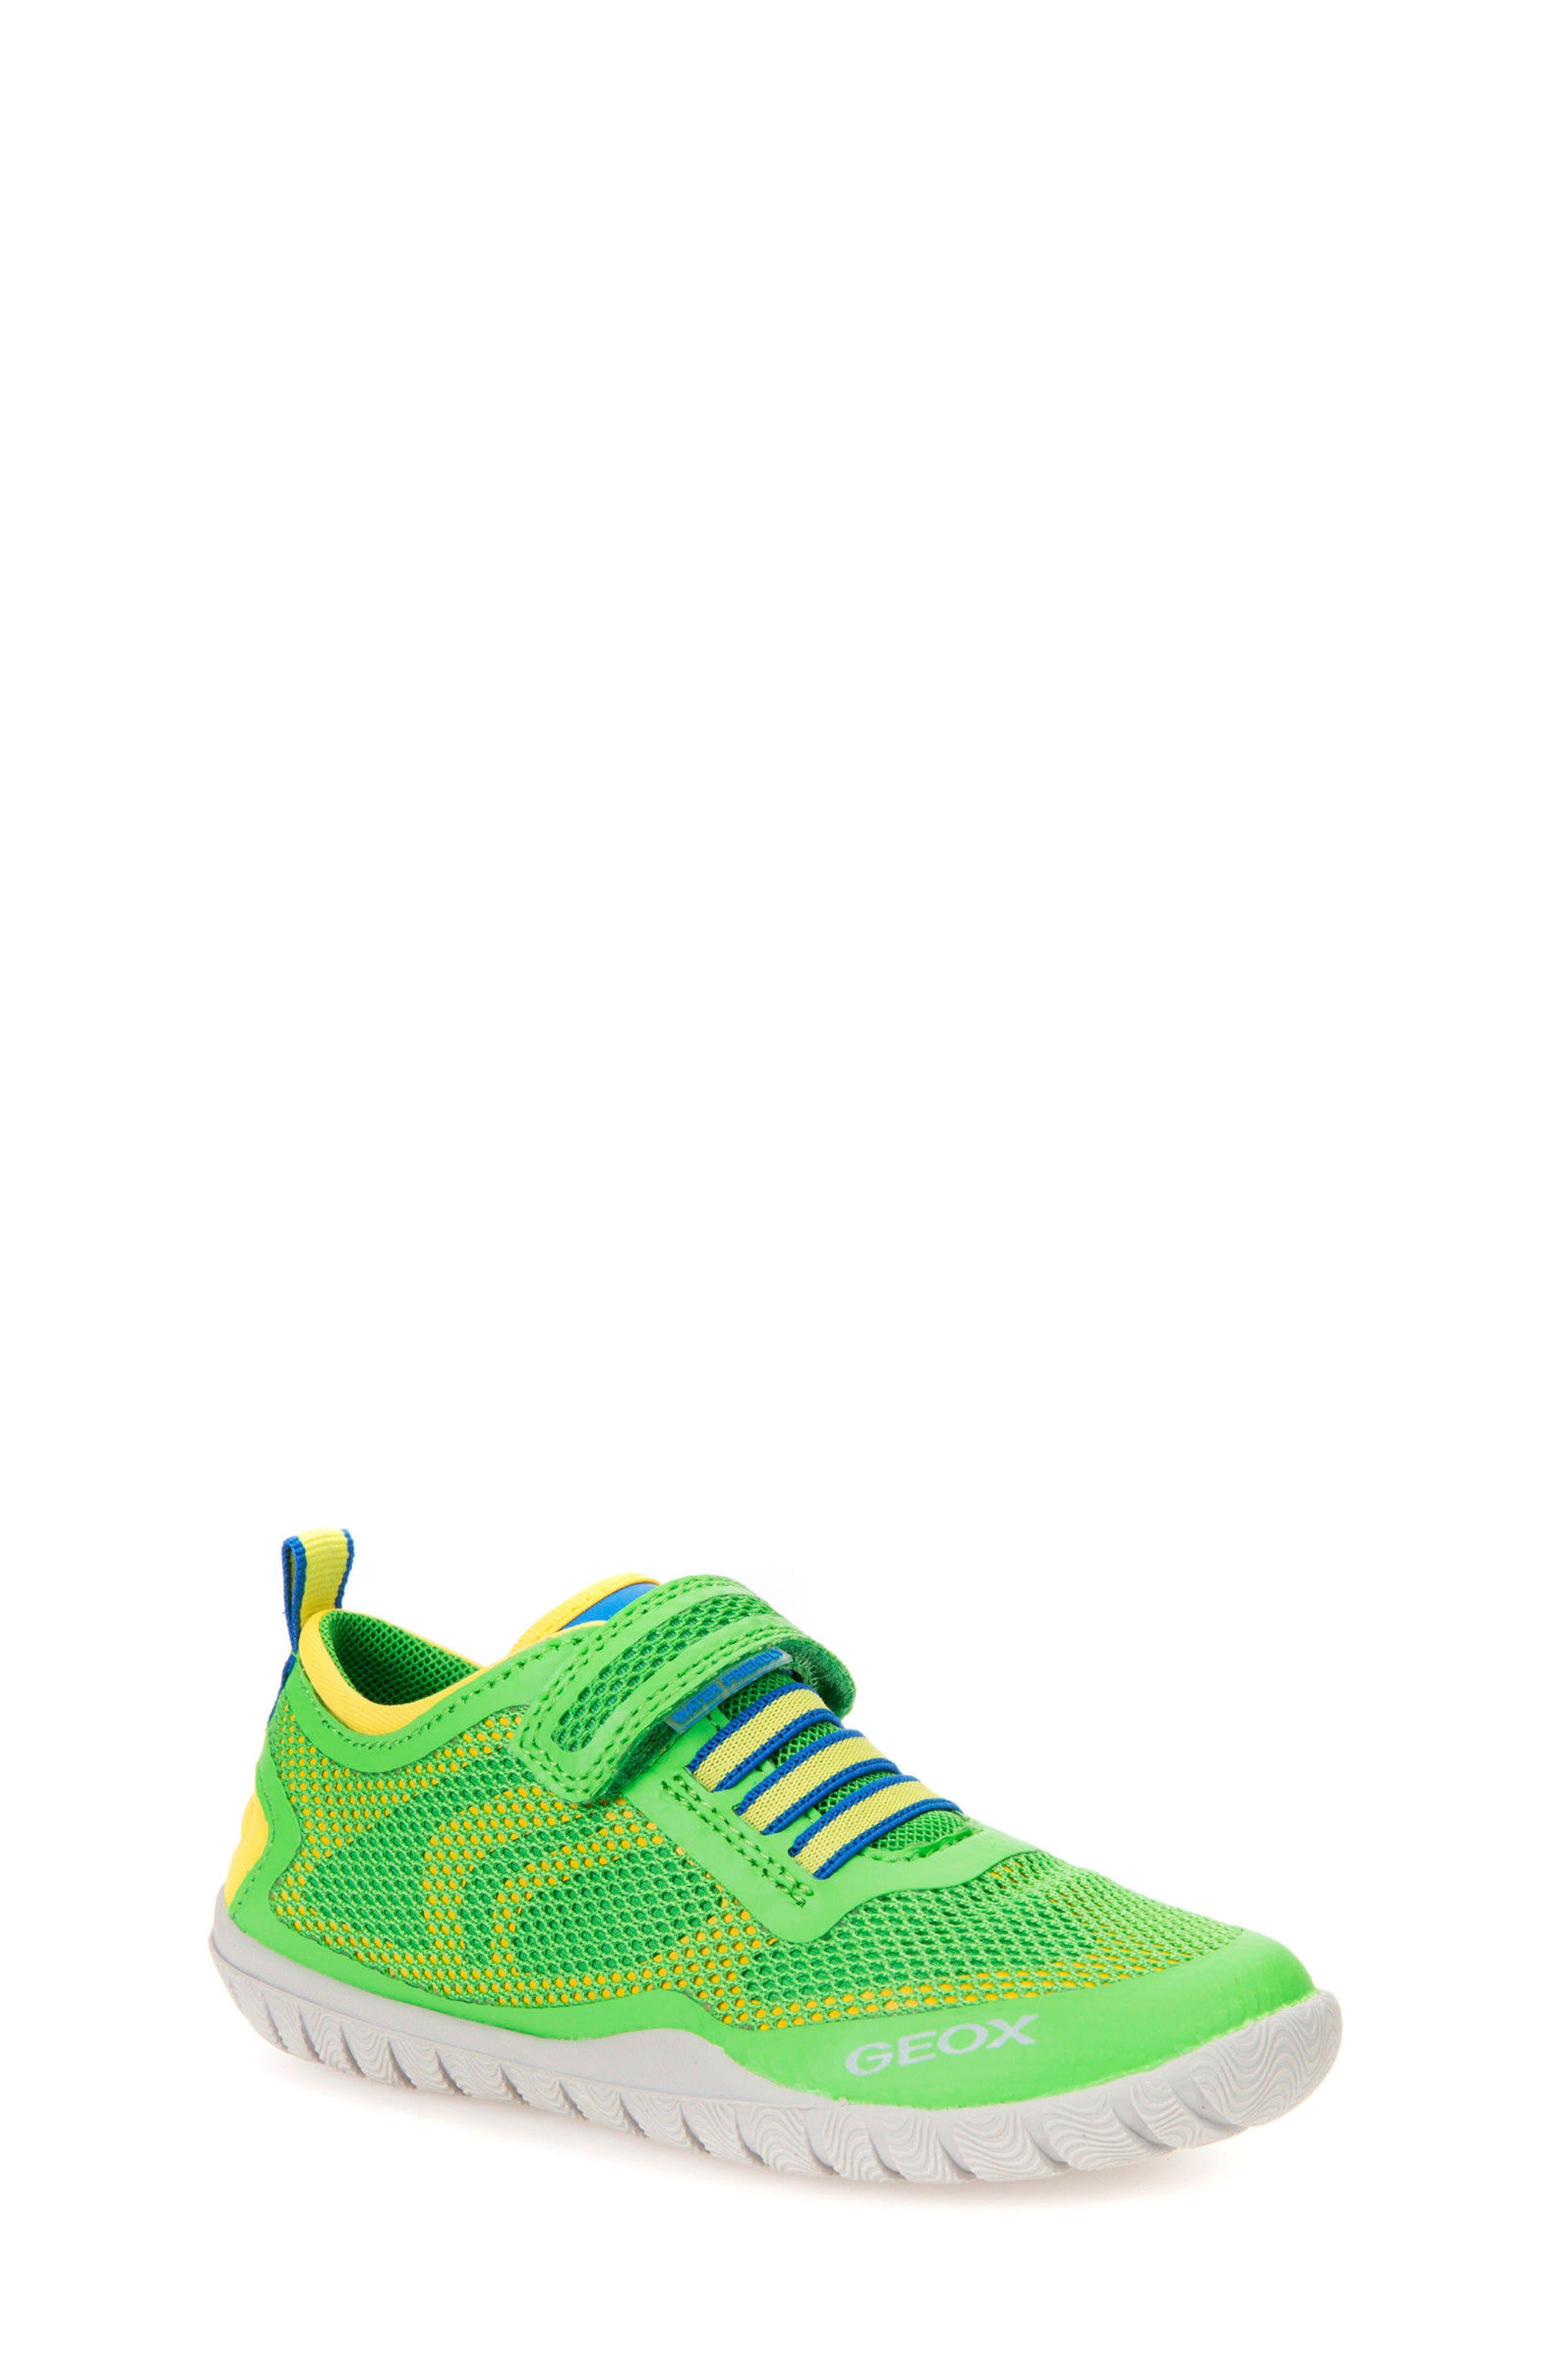 Trifon Sneaker,                             Main thumbnail 1, color,                             GREEN/ YELLOW